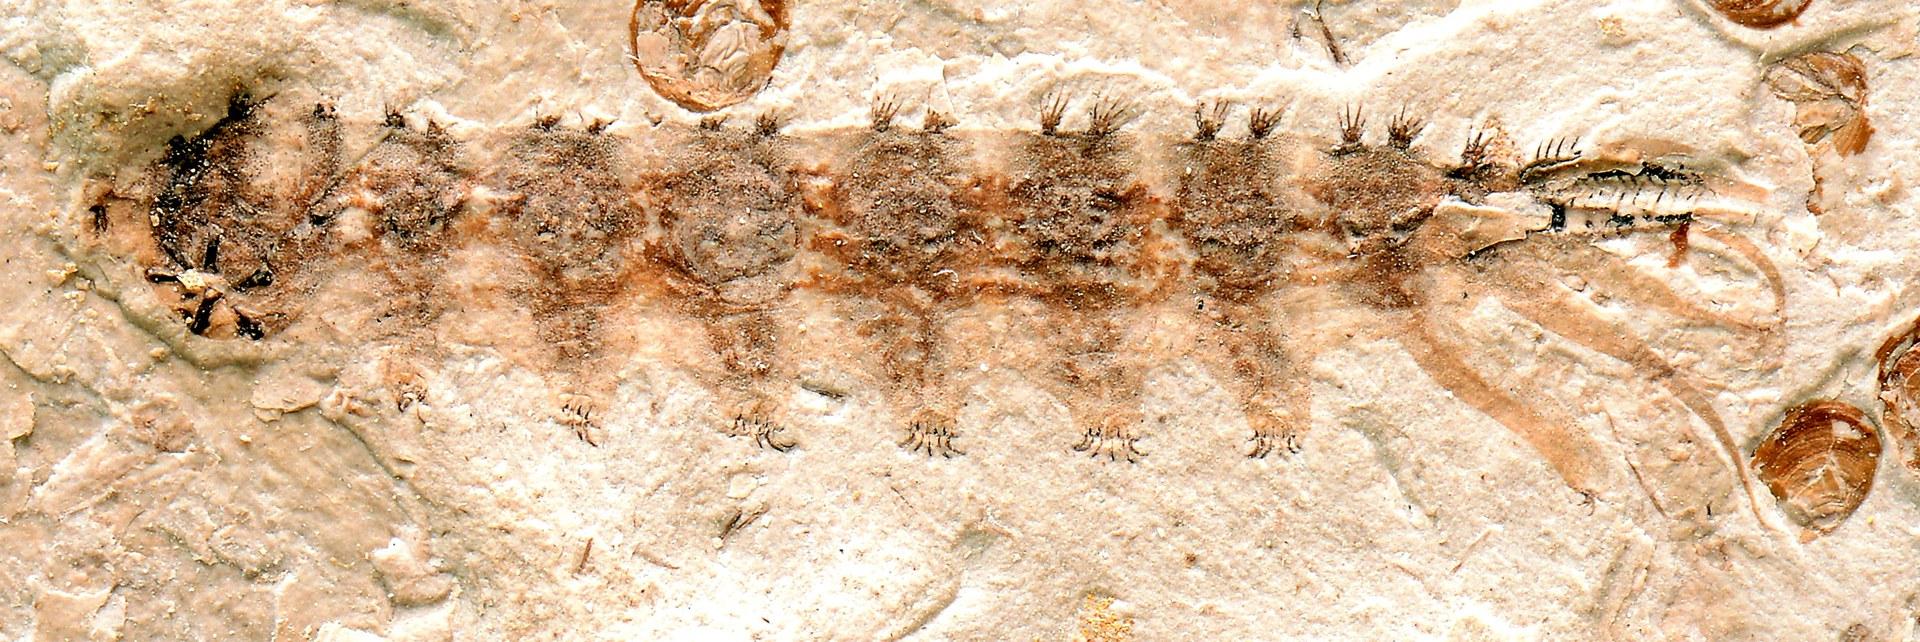 Das Fossil: